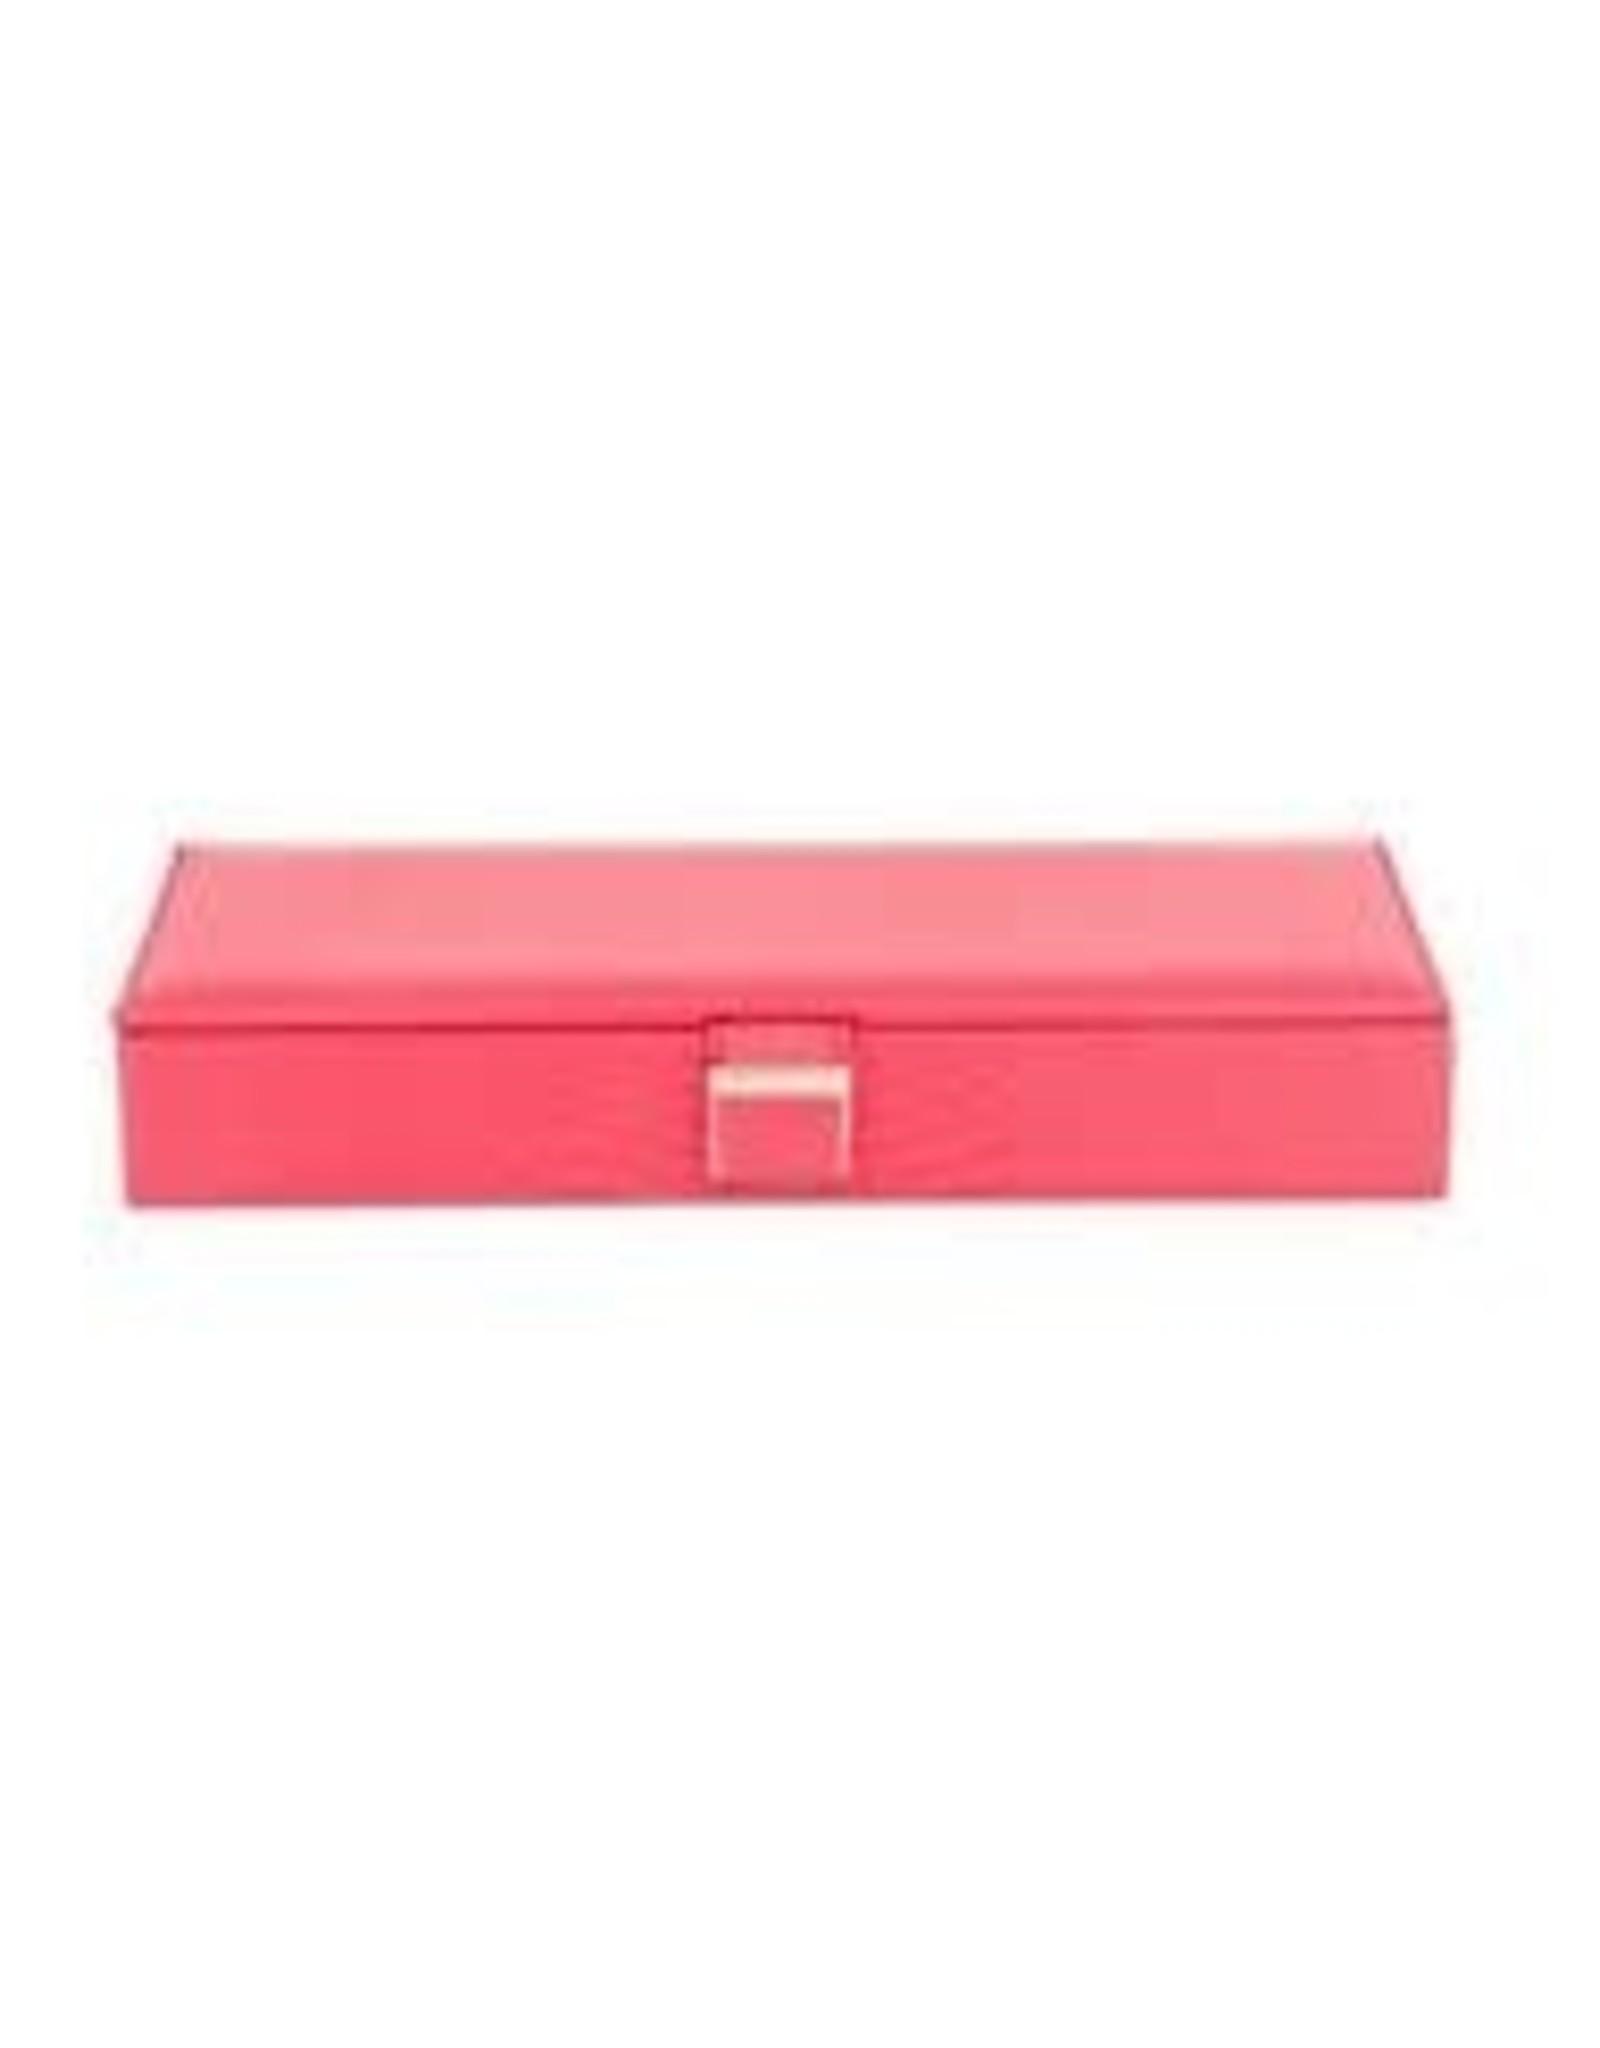 Gifts Palermo Safe Deposit  Box - Coral